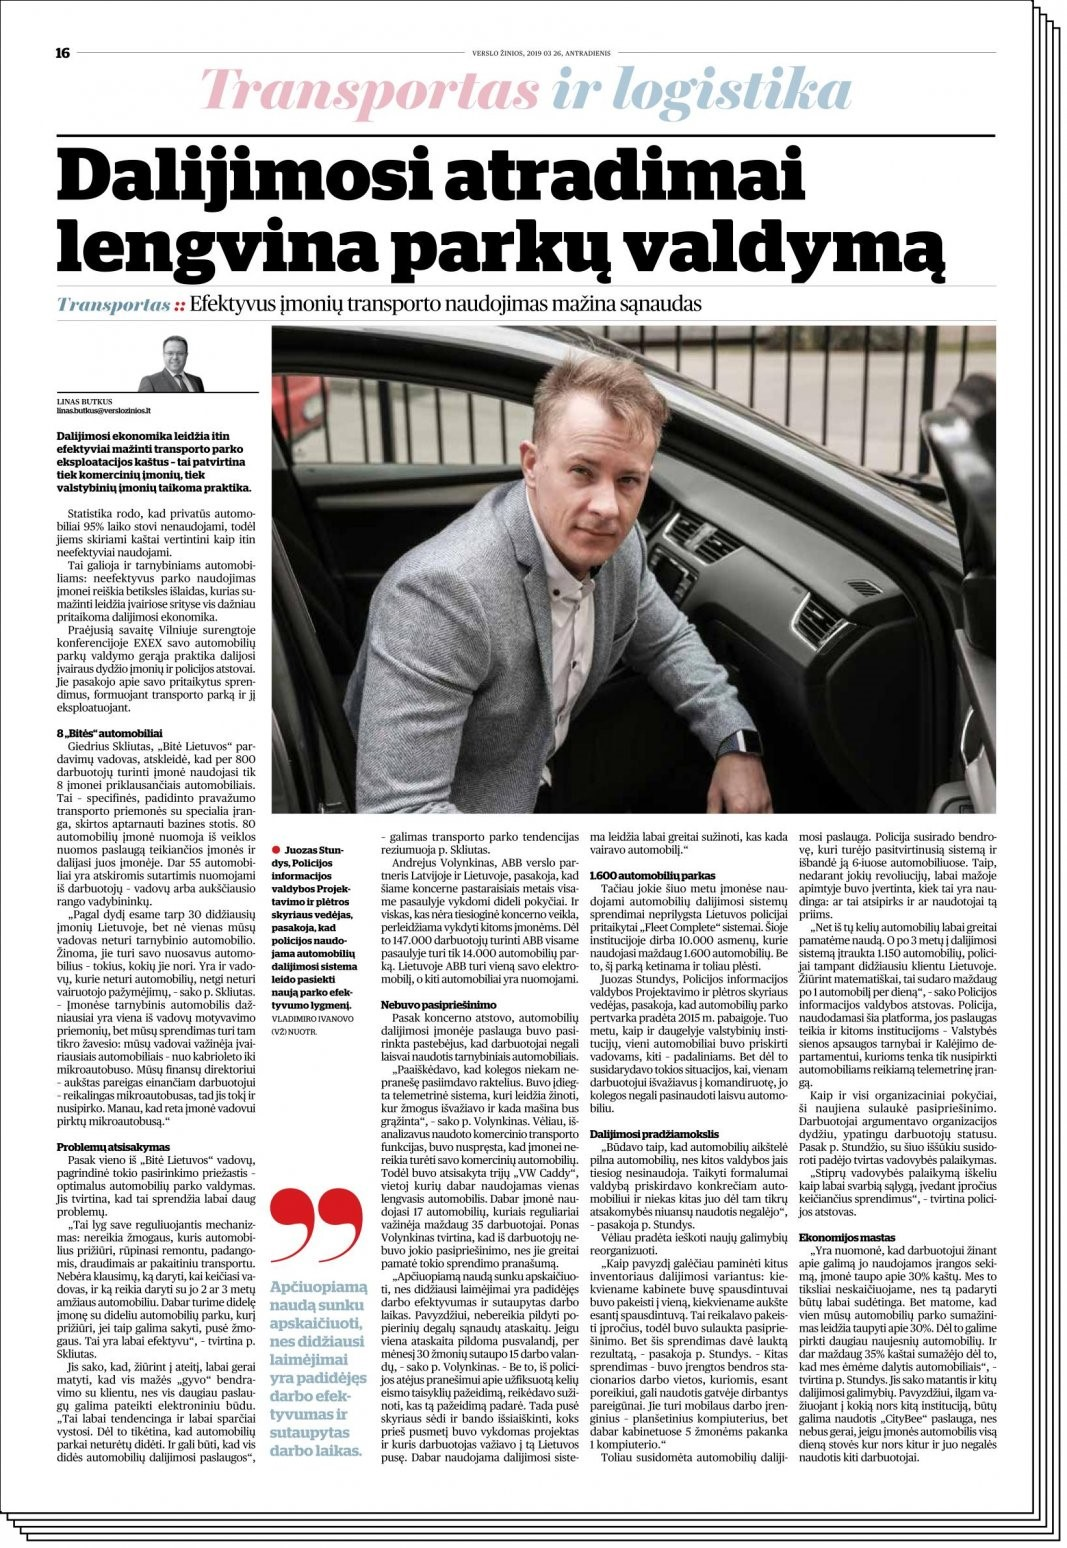 VZ lithuanian newspaper carsharing